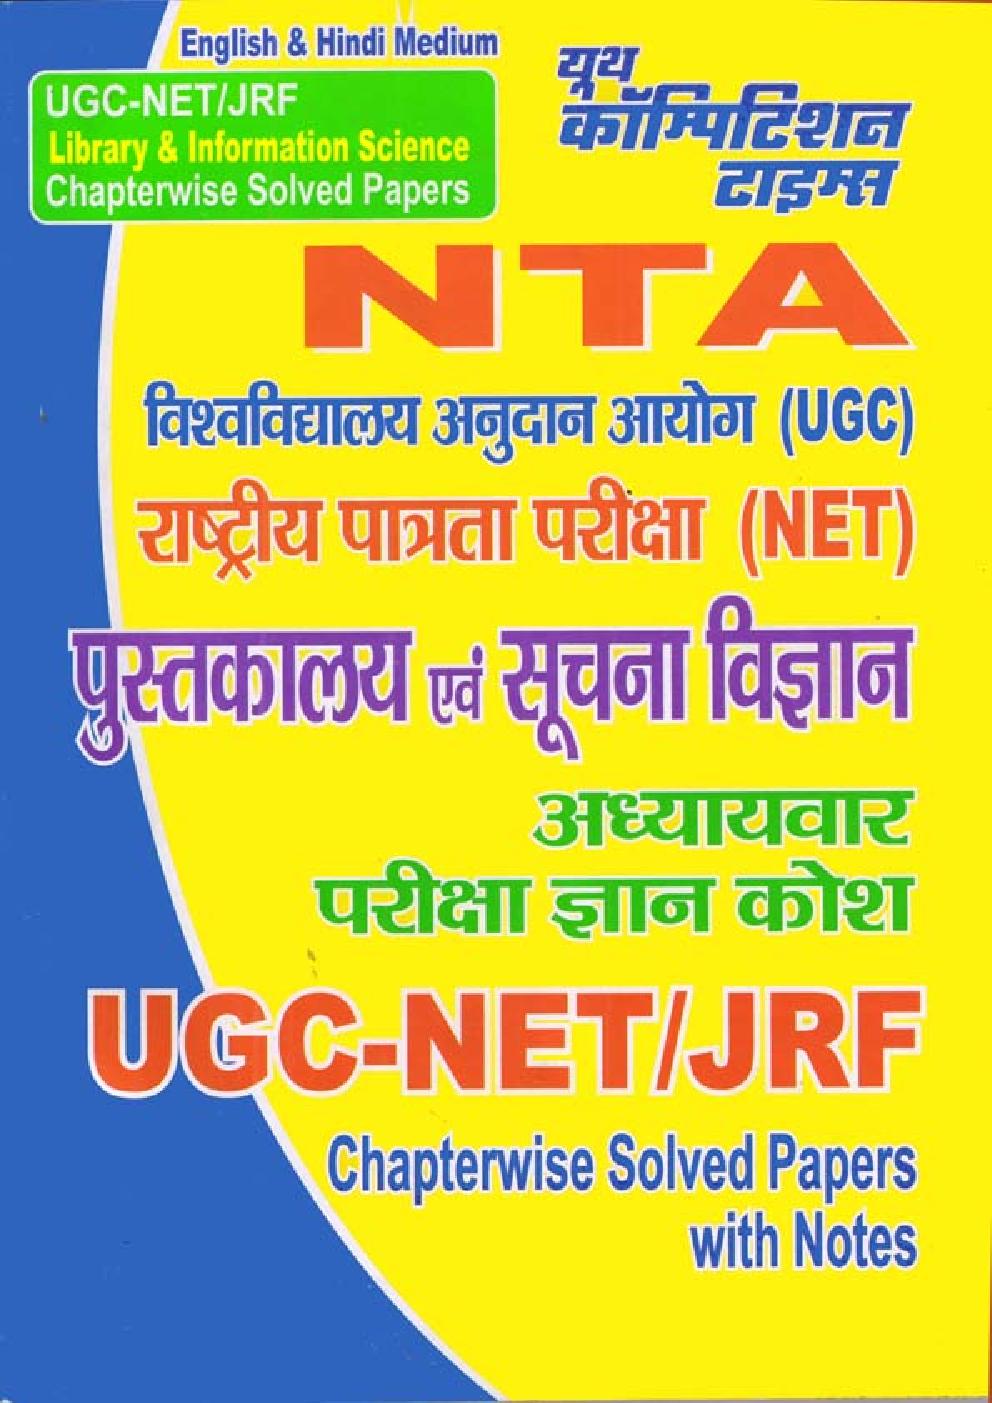 UGC-NET/JRF पुस्तकालय एवं सुचना विज्ञान Chapterwise Solved Papers - Page 1